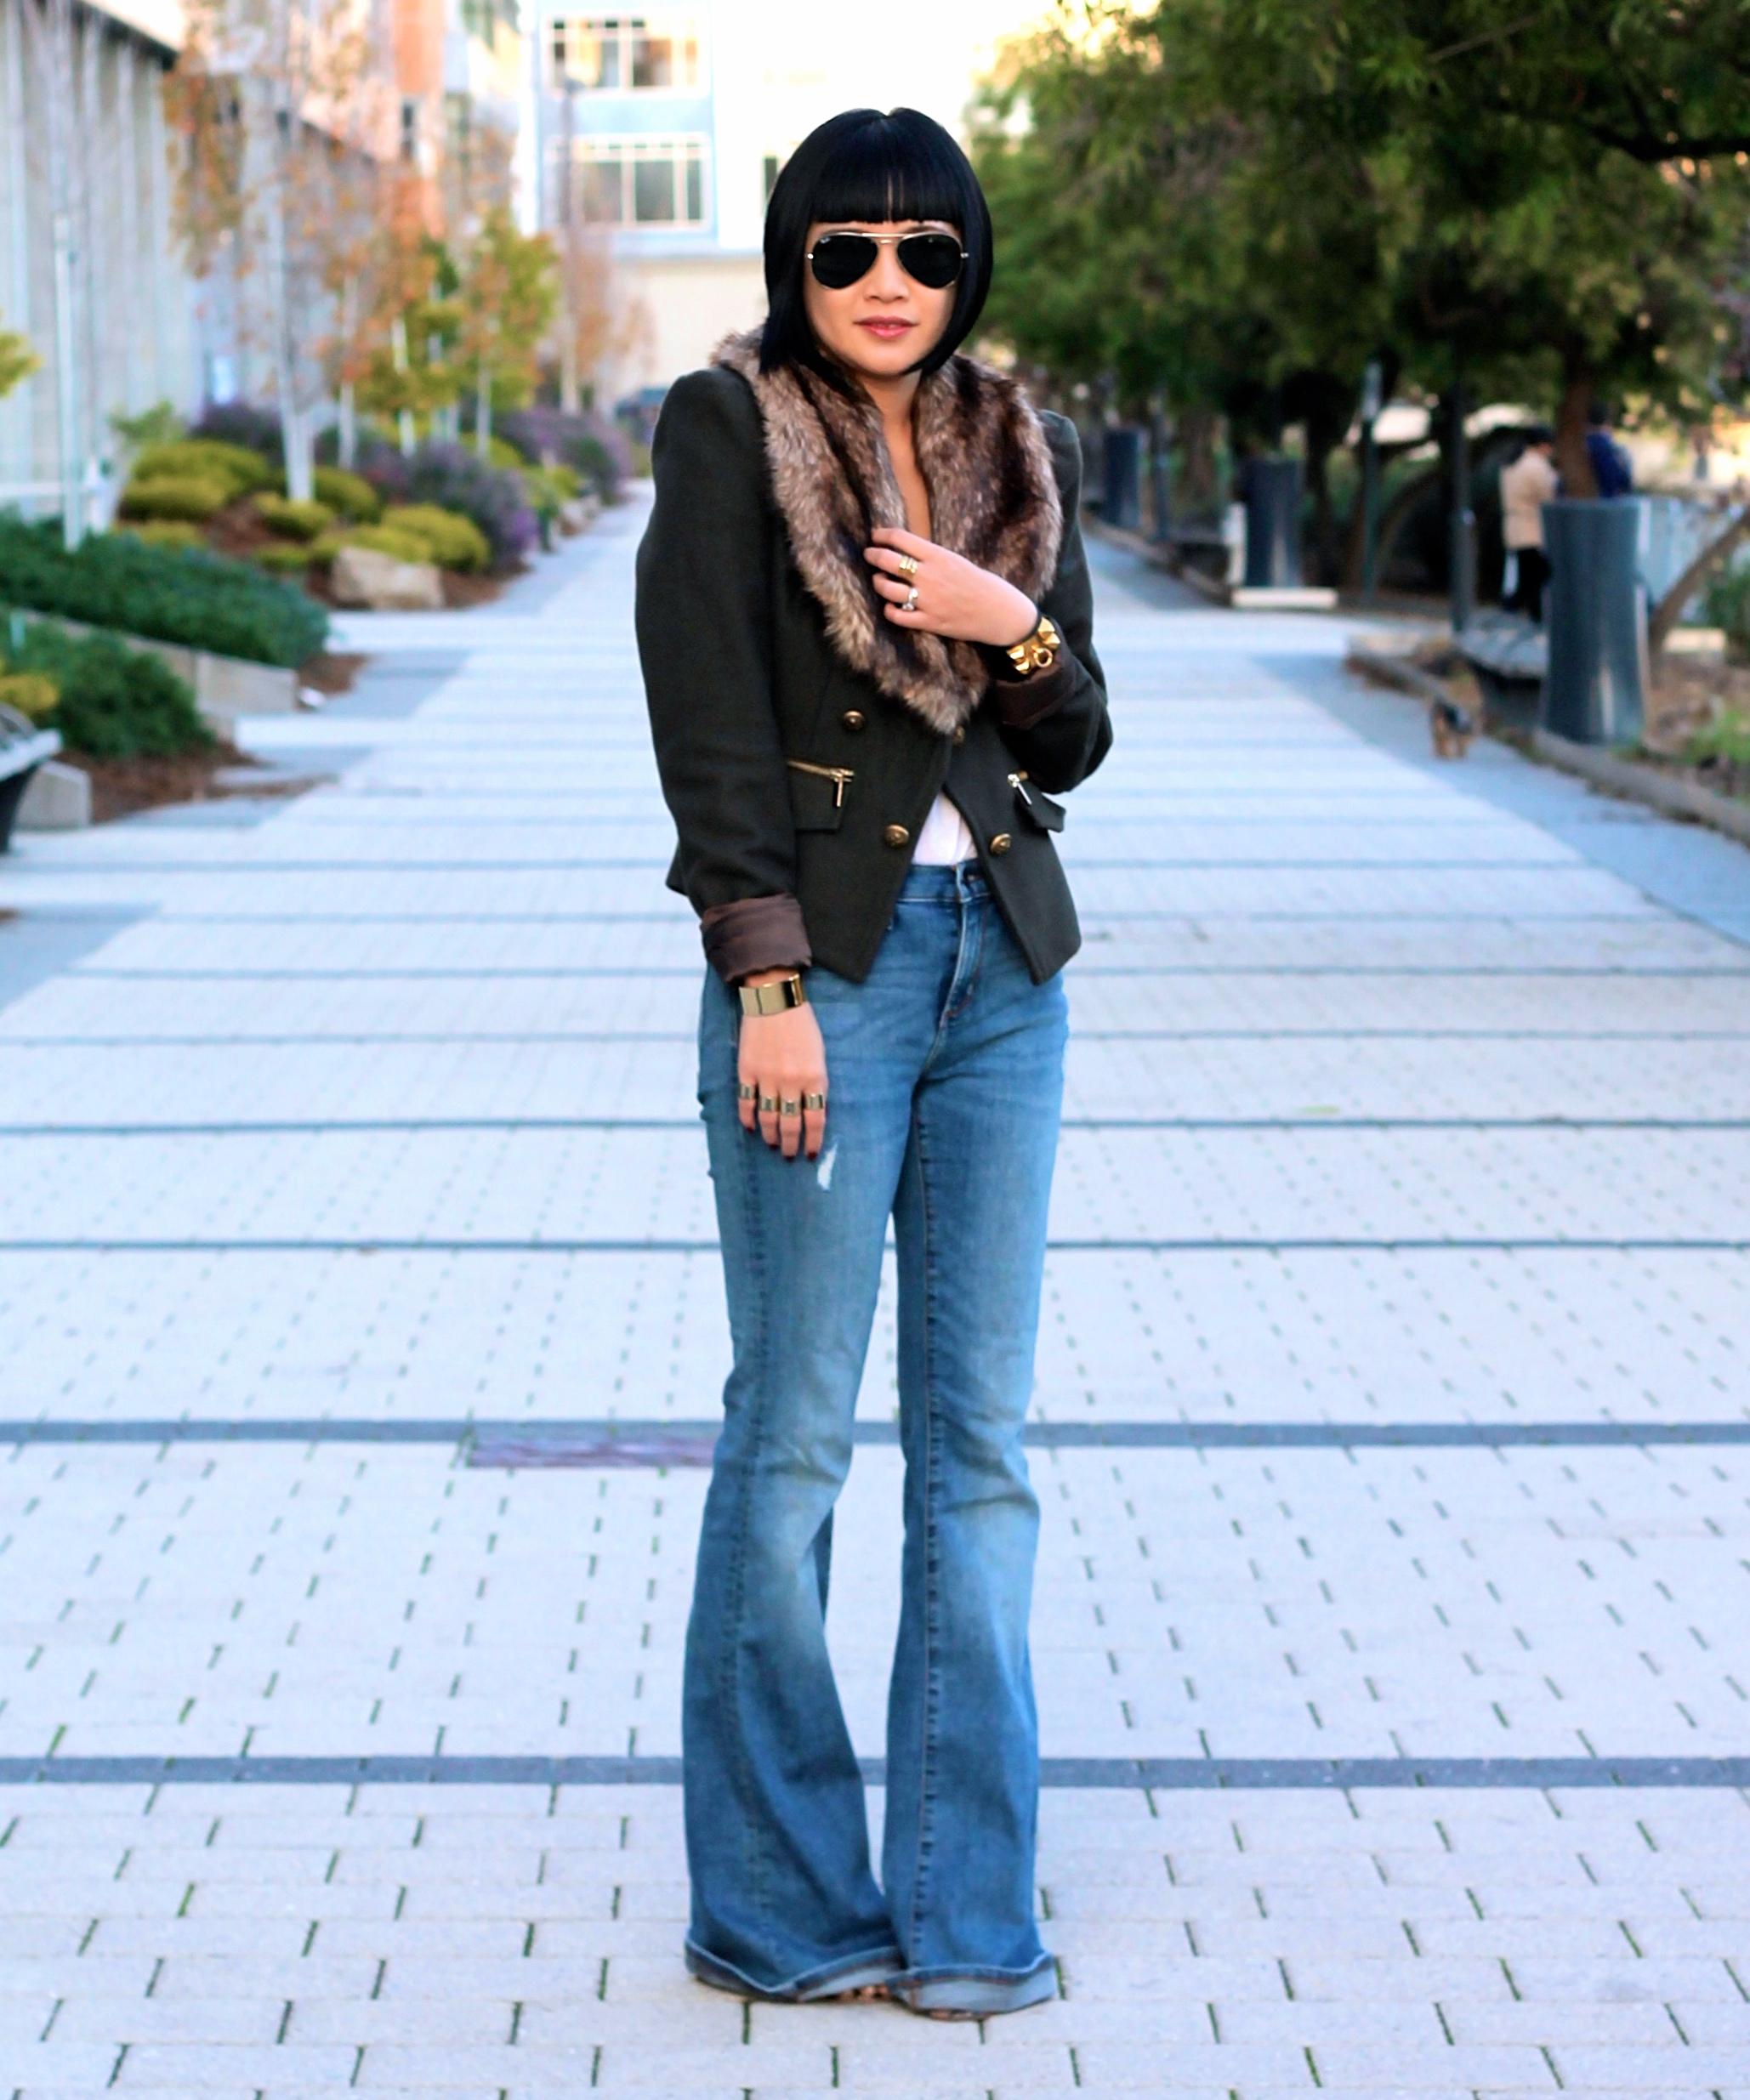 Bebe jacket, Banana Republic jeans, Ray-Ban sunglasses